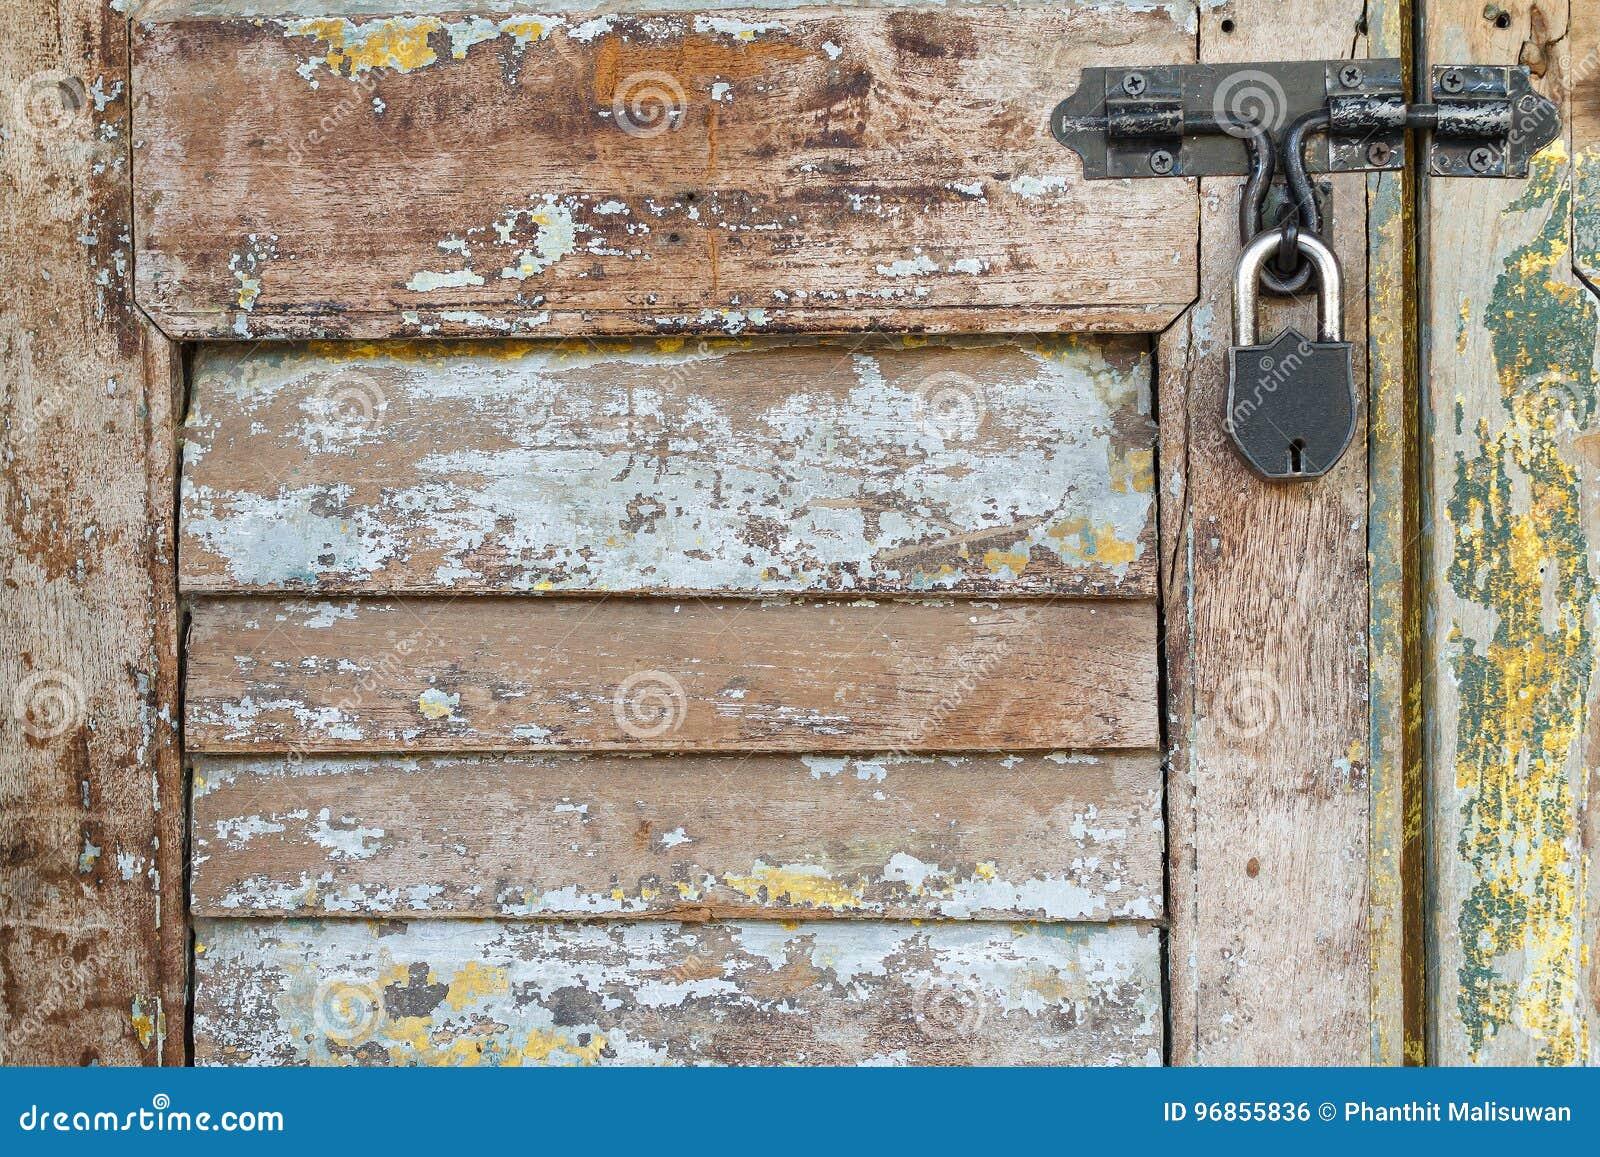 Locked Door With Key Stock Photo 56128692